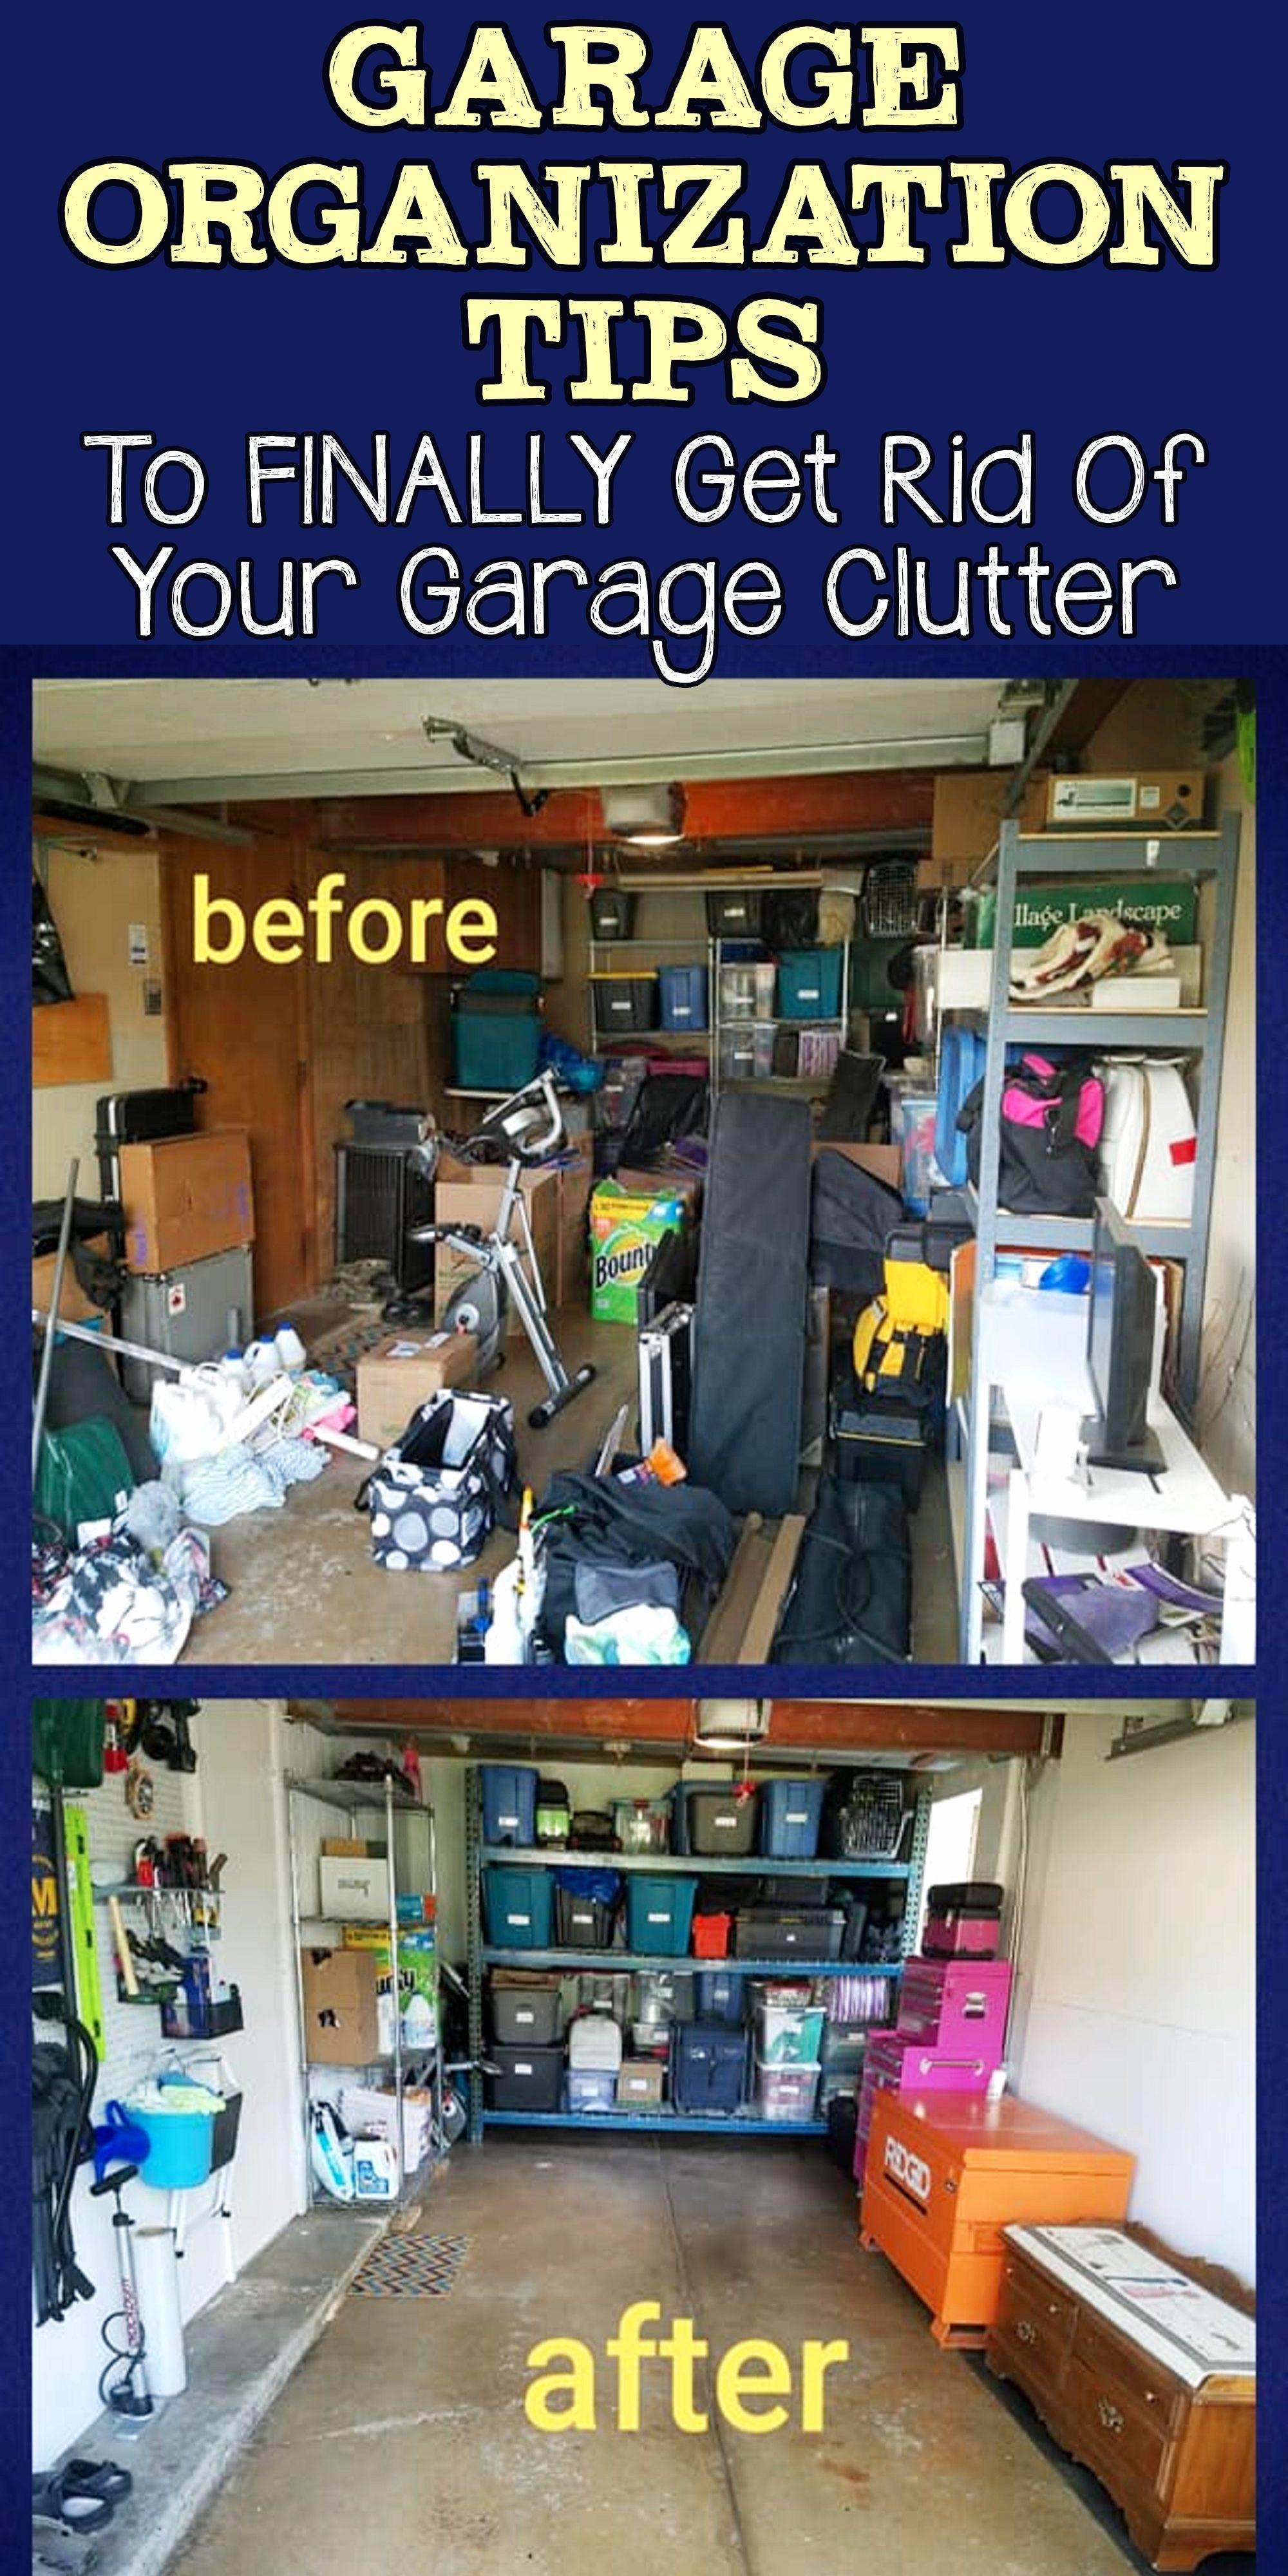 Garage Organization Tips / To FINALLY Get Rid Of Your Garage Clutter